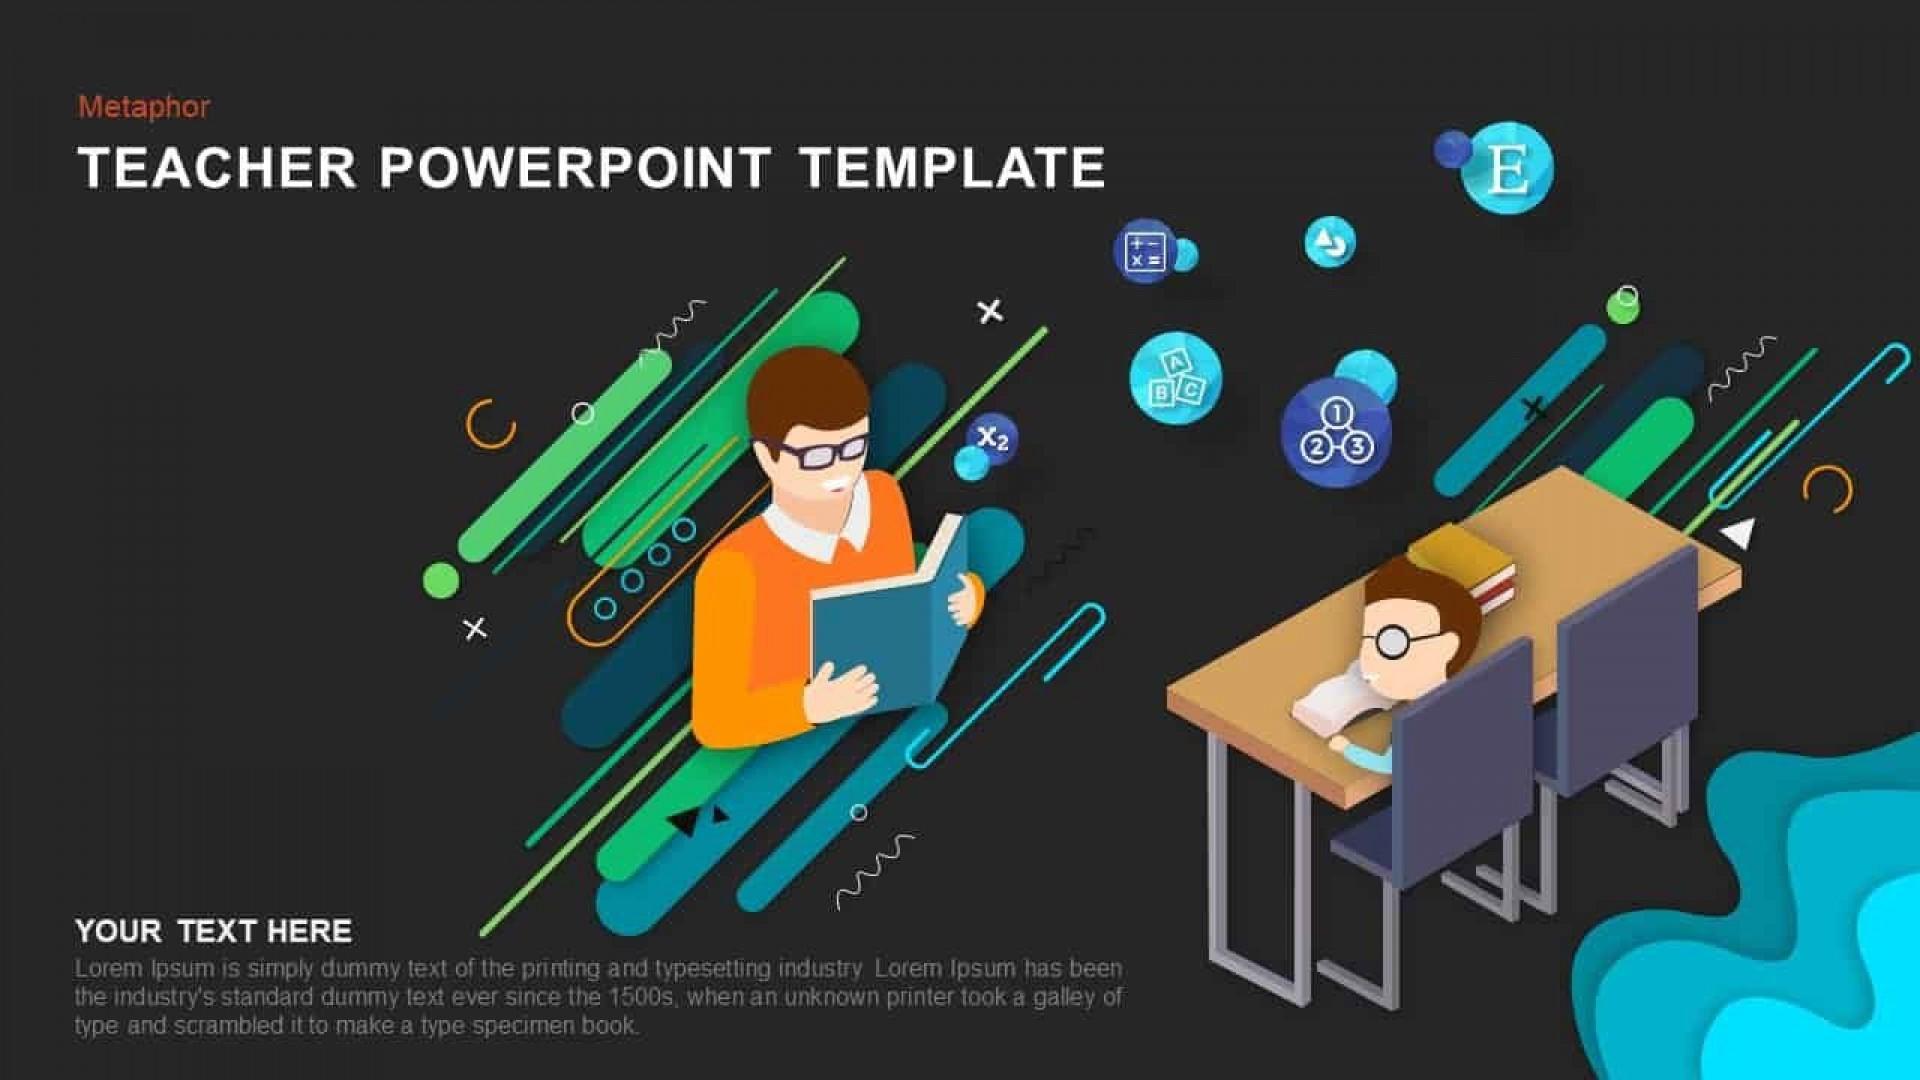 005 Imposing Ppt Template For Teacher Inspiration  Teachers Free Download Powerpoint Education Kindergarten1920